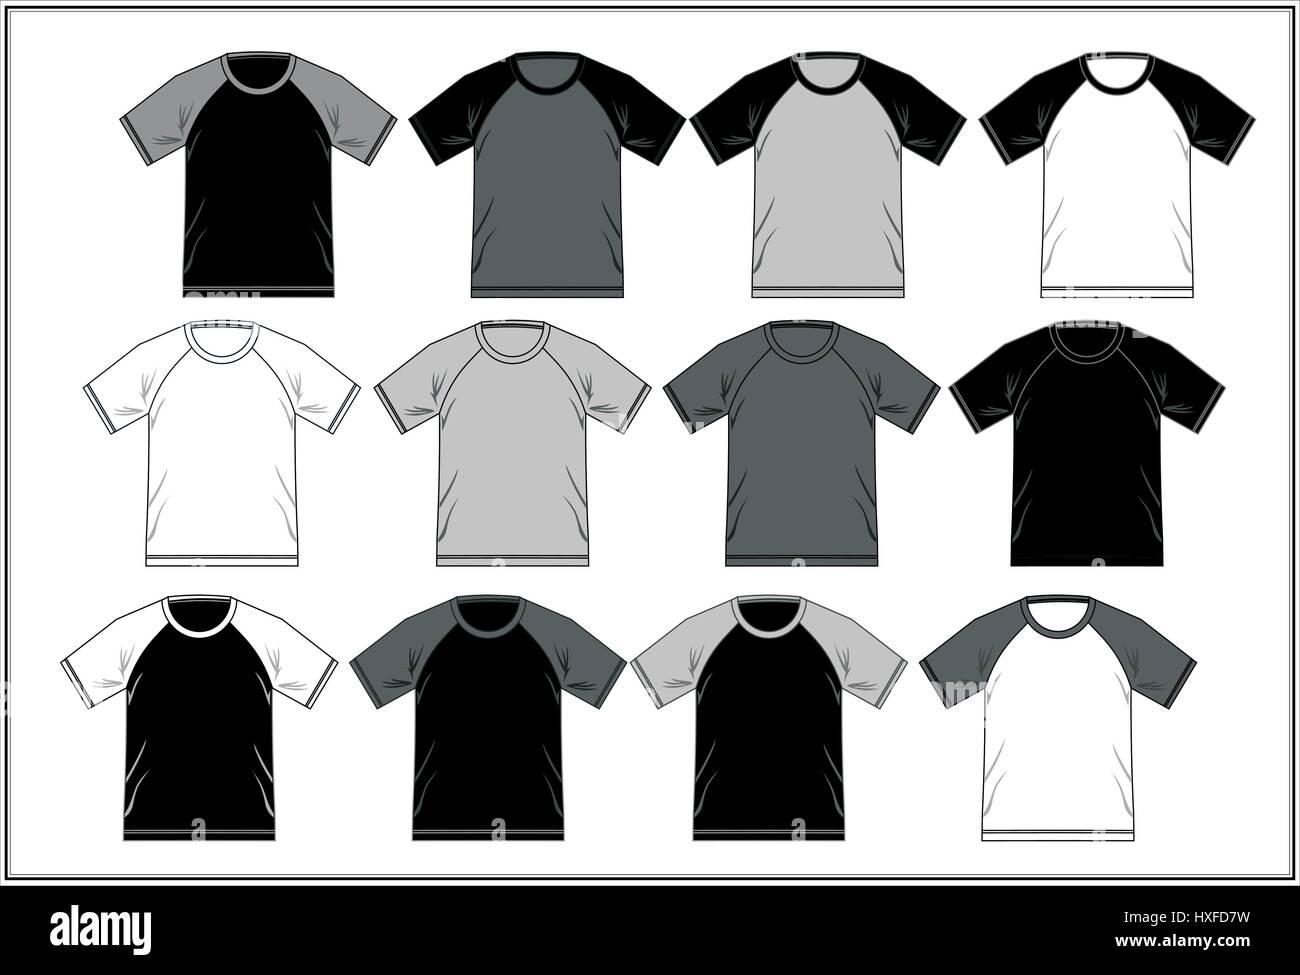 T Shirt Template Raglan Black White, Vector - Stock Image